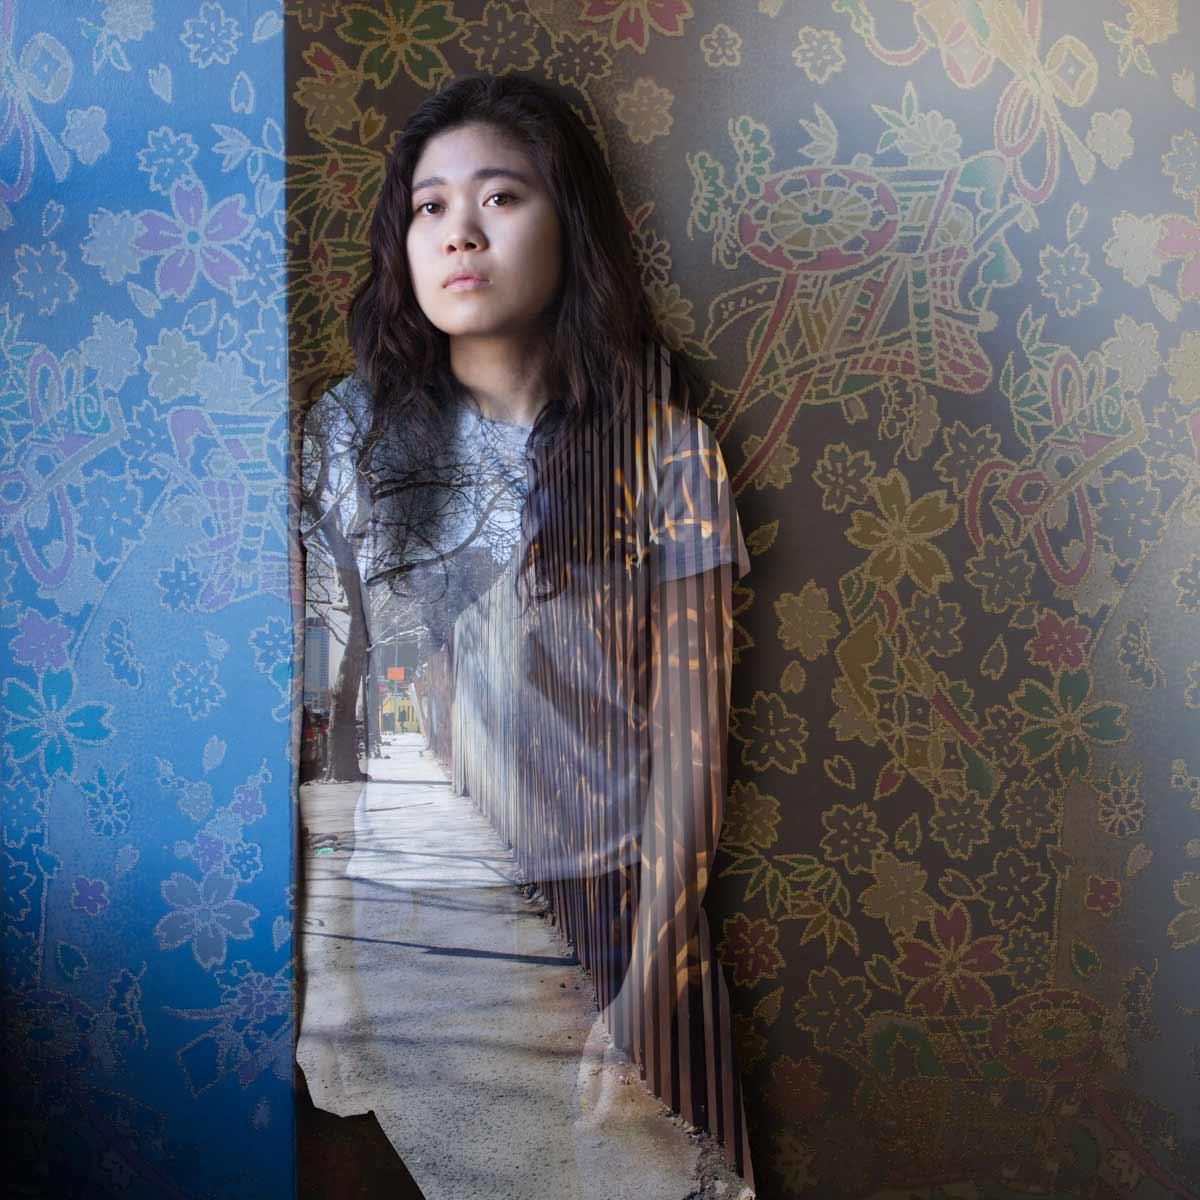 Saudi Photographer, Bilo Hussein, Takes Portraits of Women Far From Home